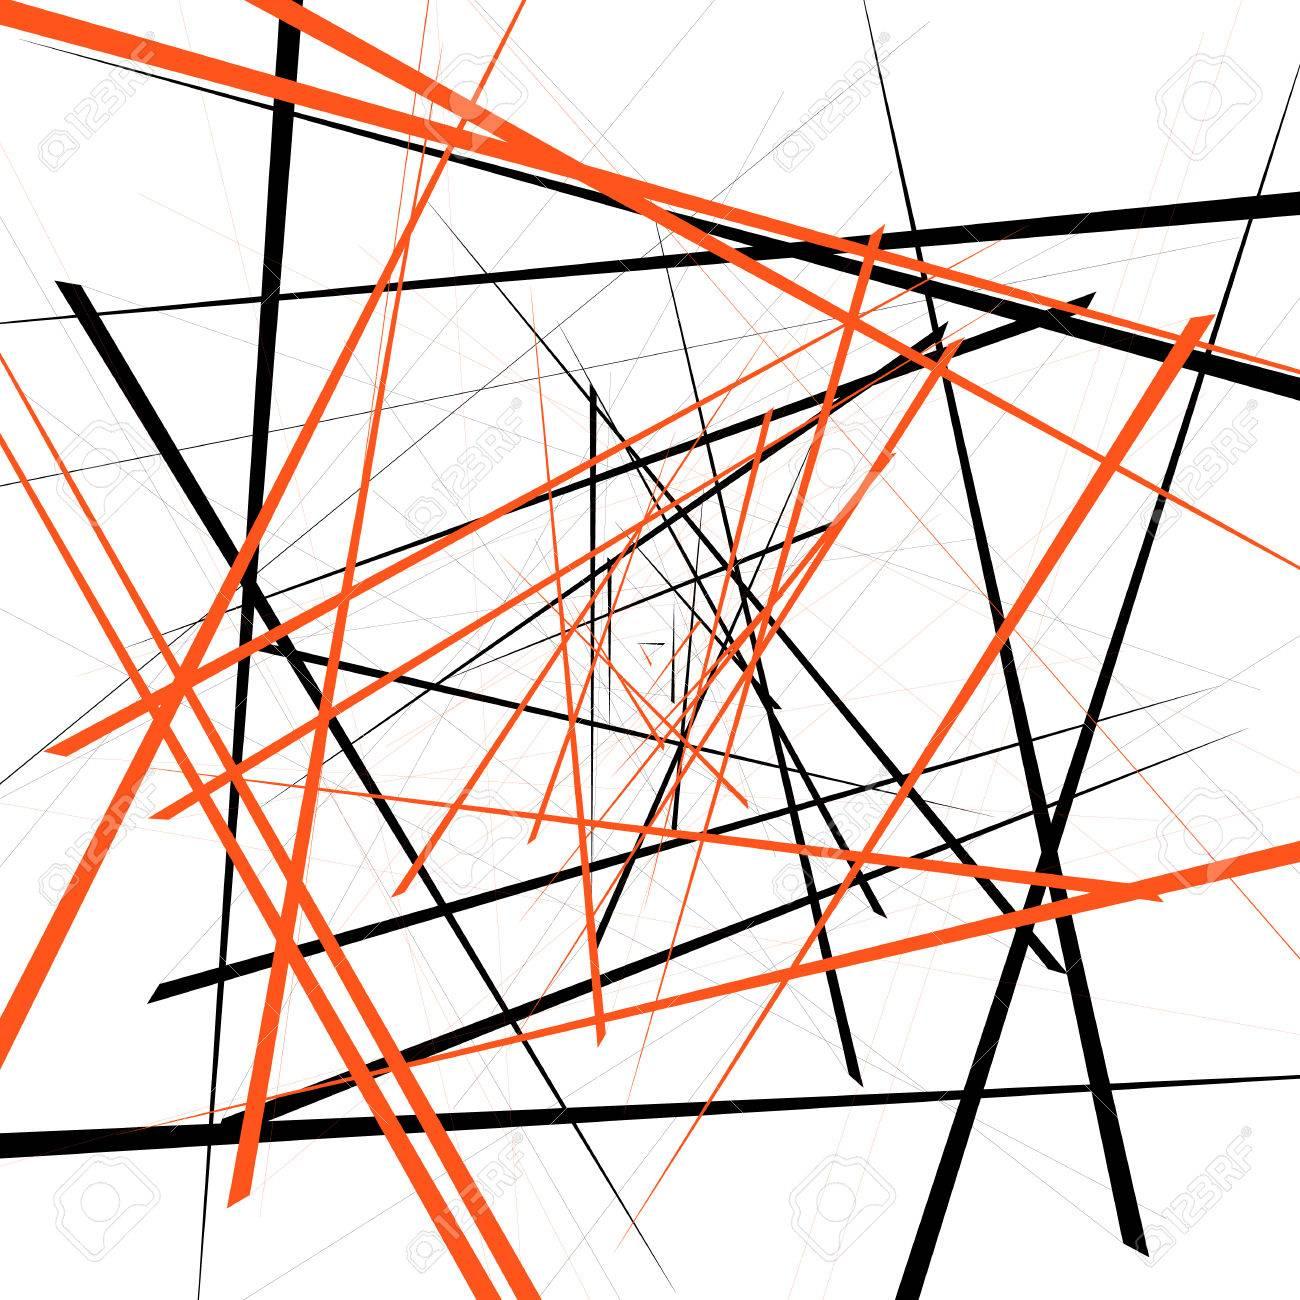 Geometric Illustration With Random Intersecting Lines Editable